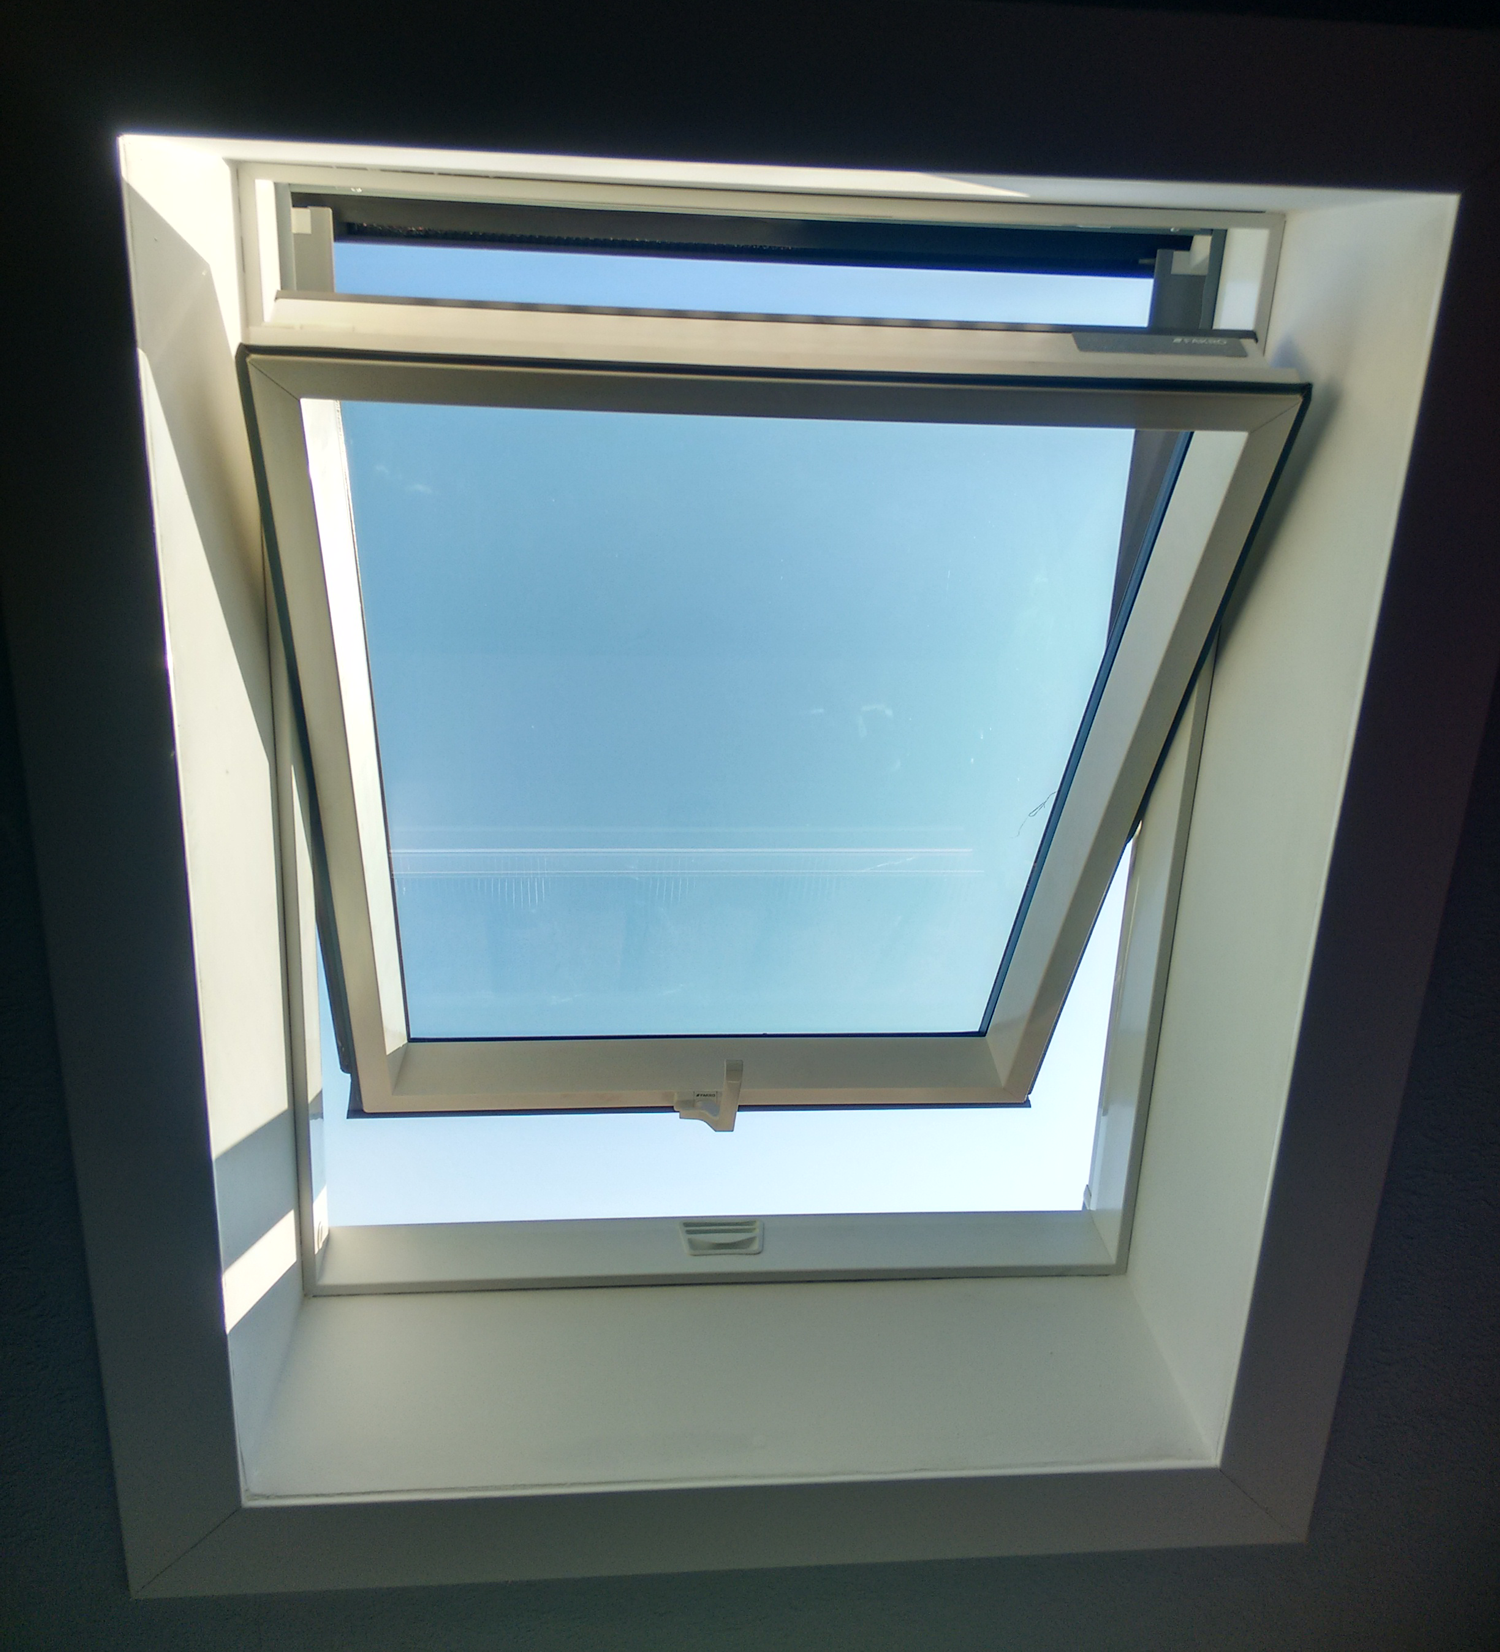 Internal shot of opened, PVC roof window